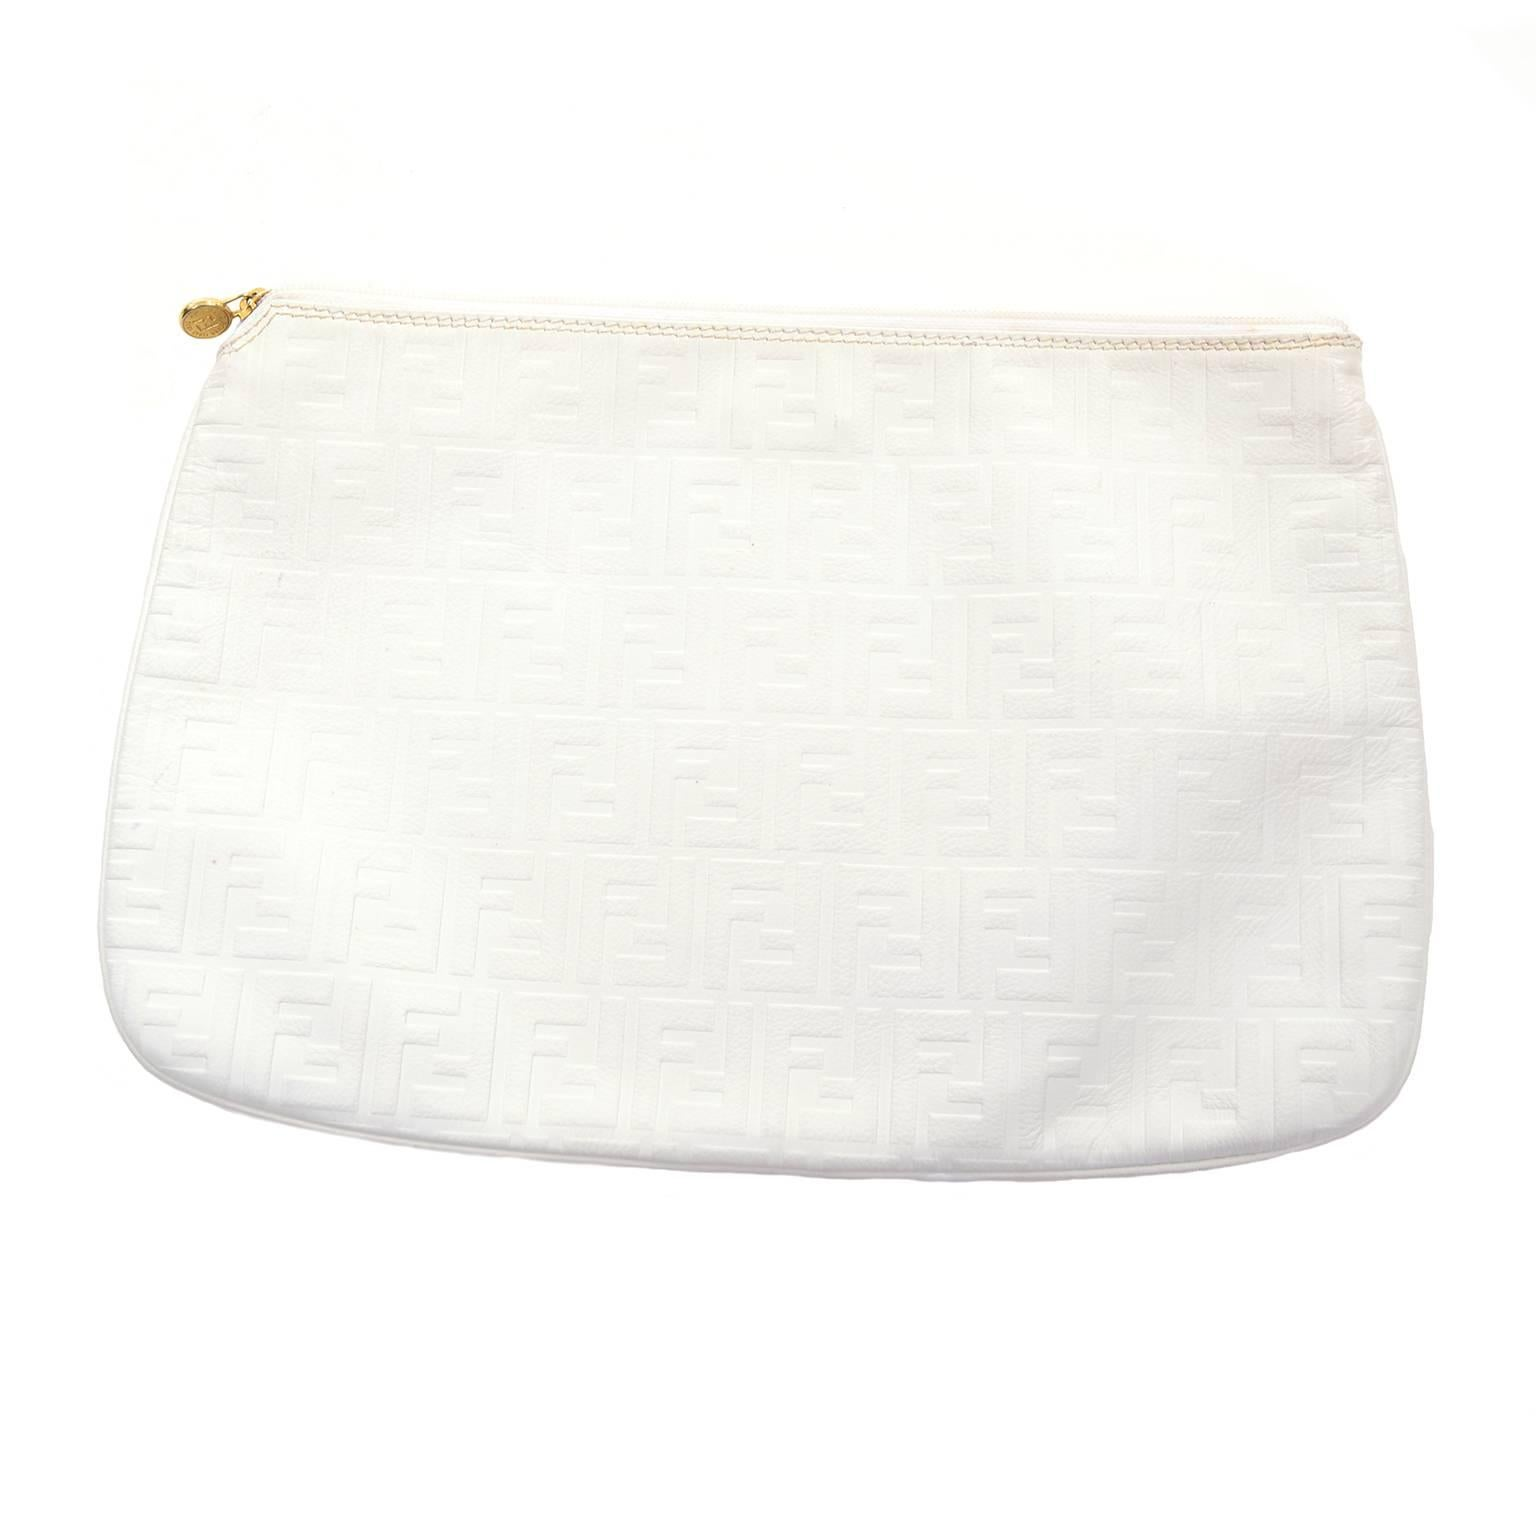 Fendi Vintage Fendi Handbag In White Leather Oversized Clutch W/ F Logo Pattern gp3tw